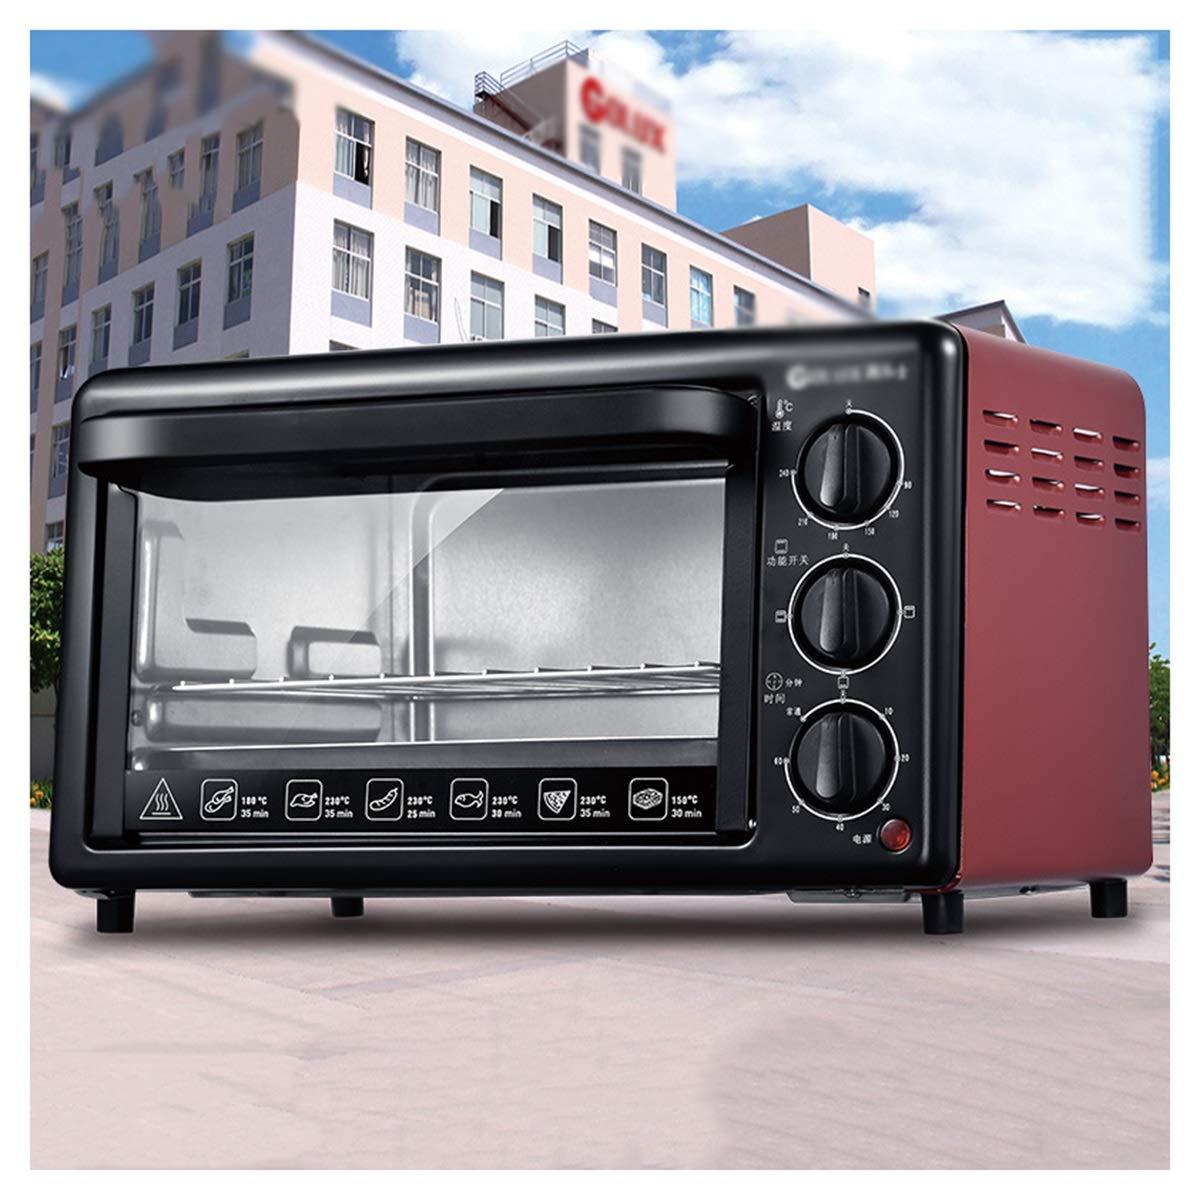 ZCYX ミニオーブン - 多機能電気オーブン19リス電気オーブンボックス家庭用ベーキングケーキピザオーブン -7487 オーブン (色 : 赤) B07RWMDDBS 赤